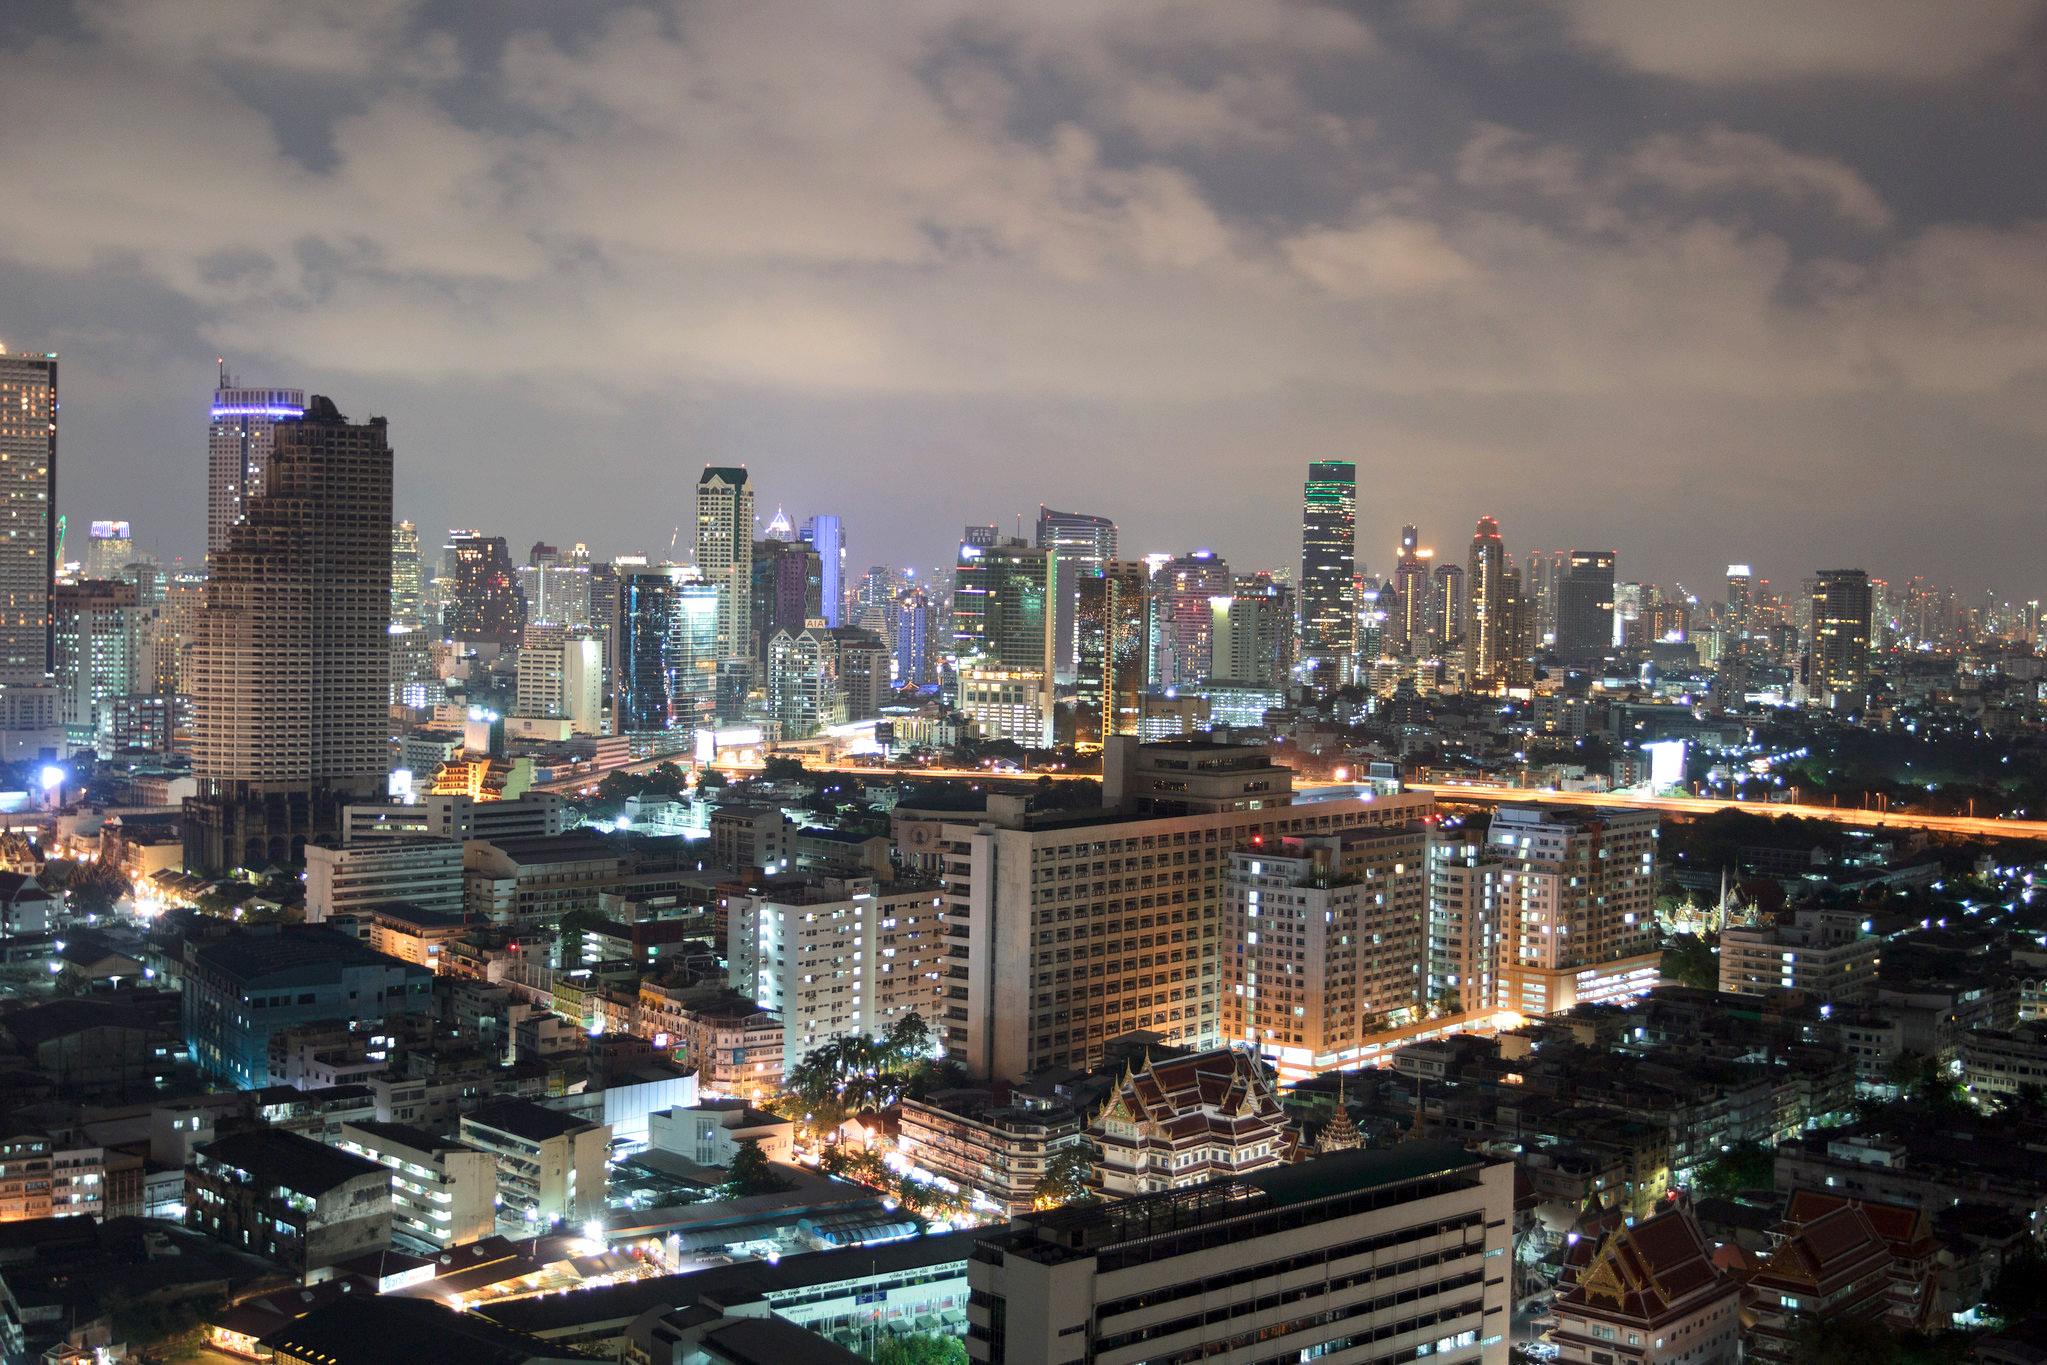 City of lights by Sabina Mismas.jpg